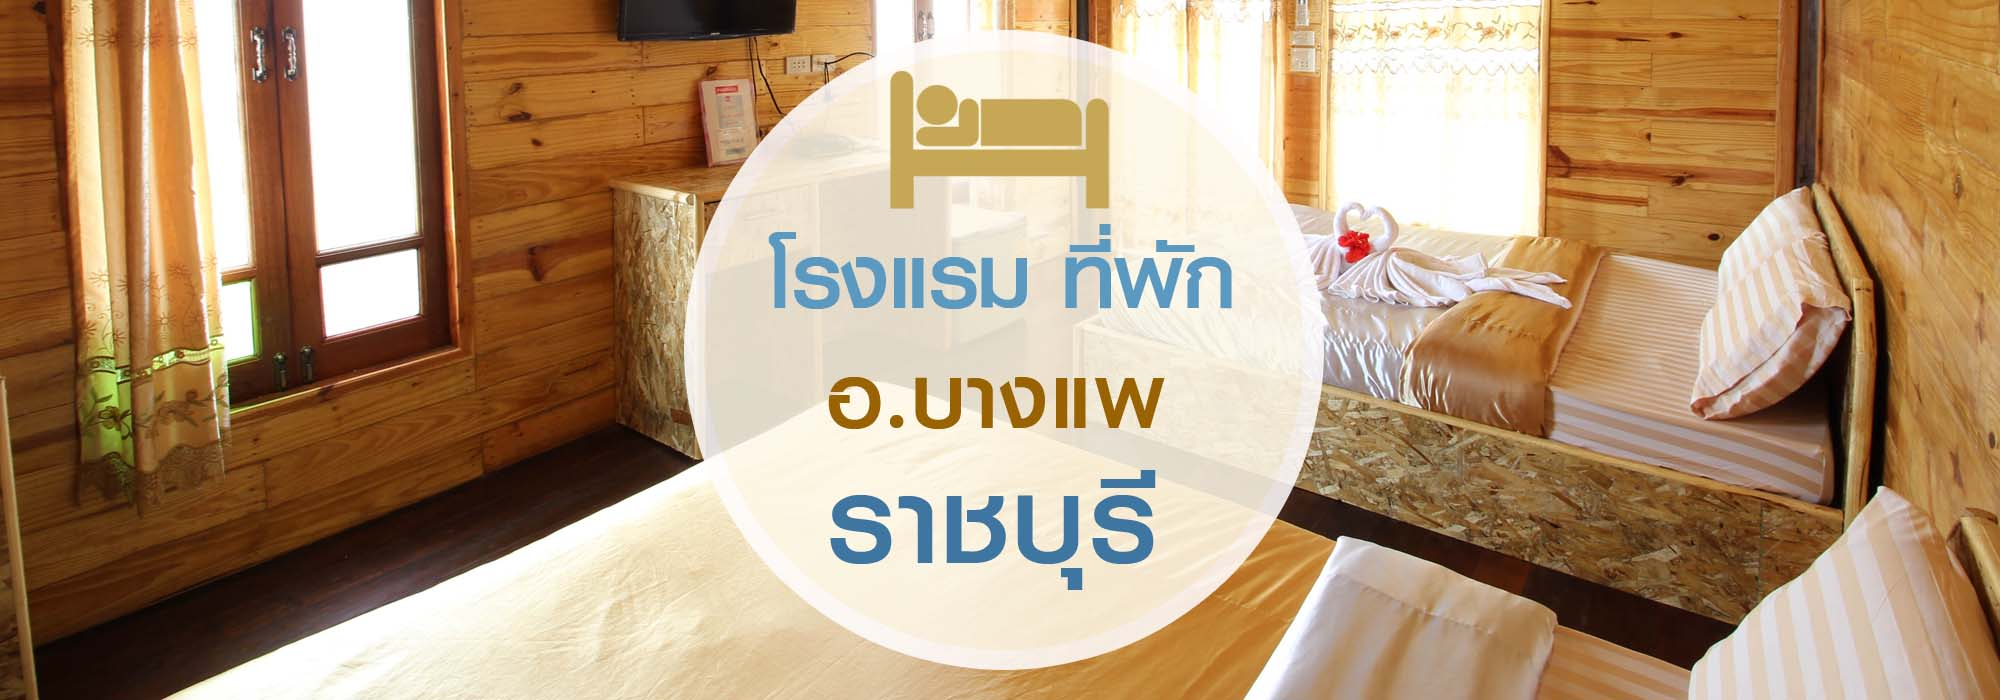 hotel rb_b